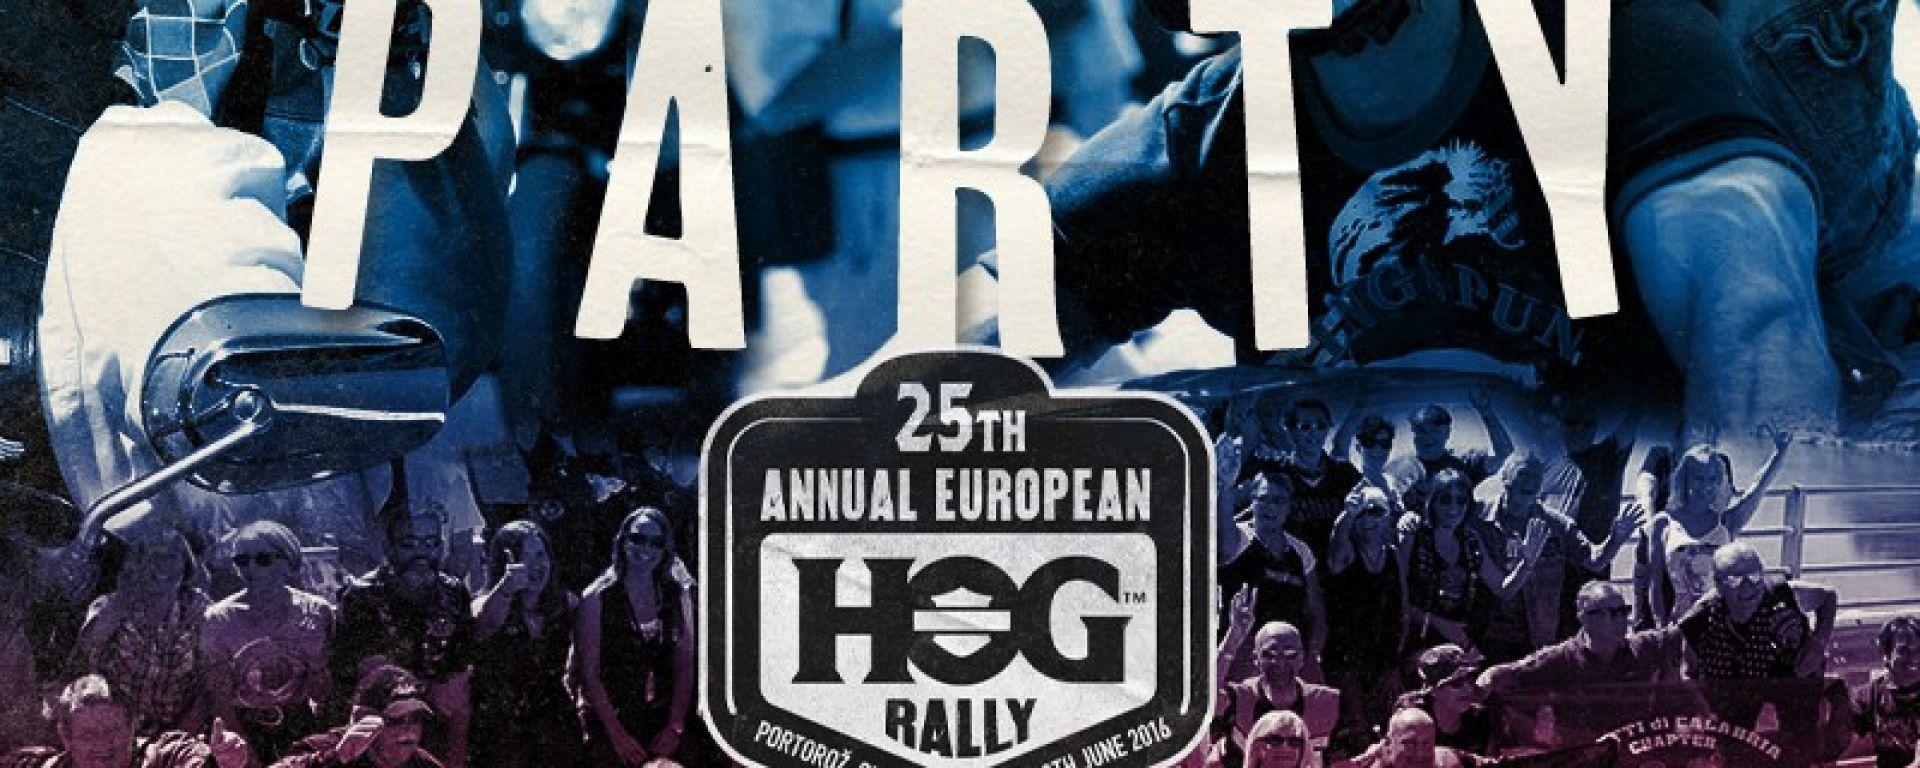 Harley-Davidson: il 25° H.O.G. Rally si sposta in Slovenia